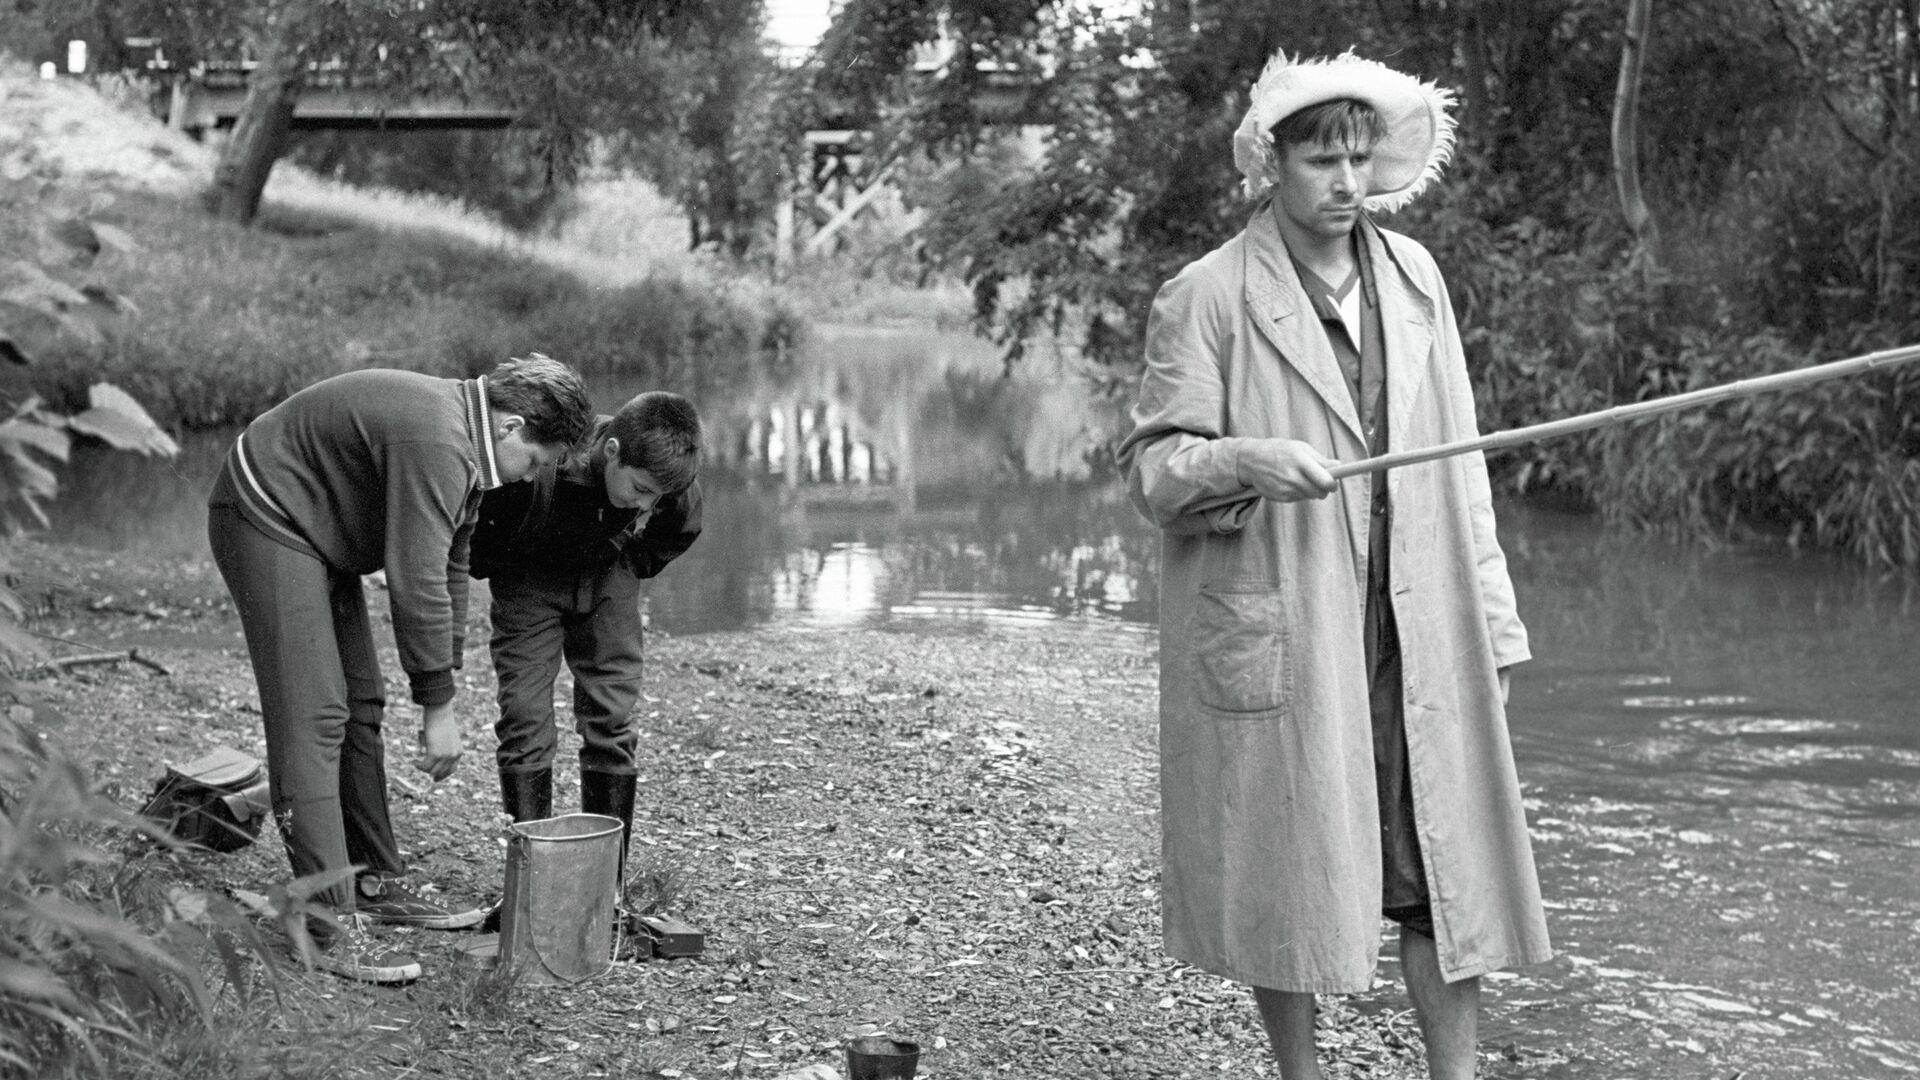 Лев Яшин (справа) - РИА Новости, 1920, 30.04.2020